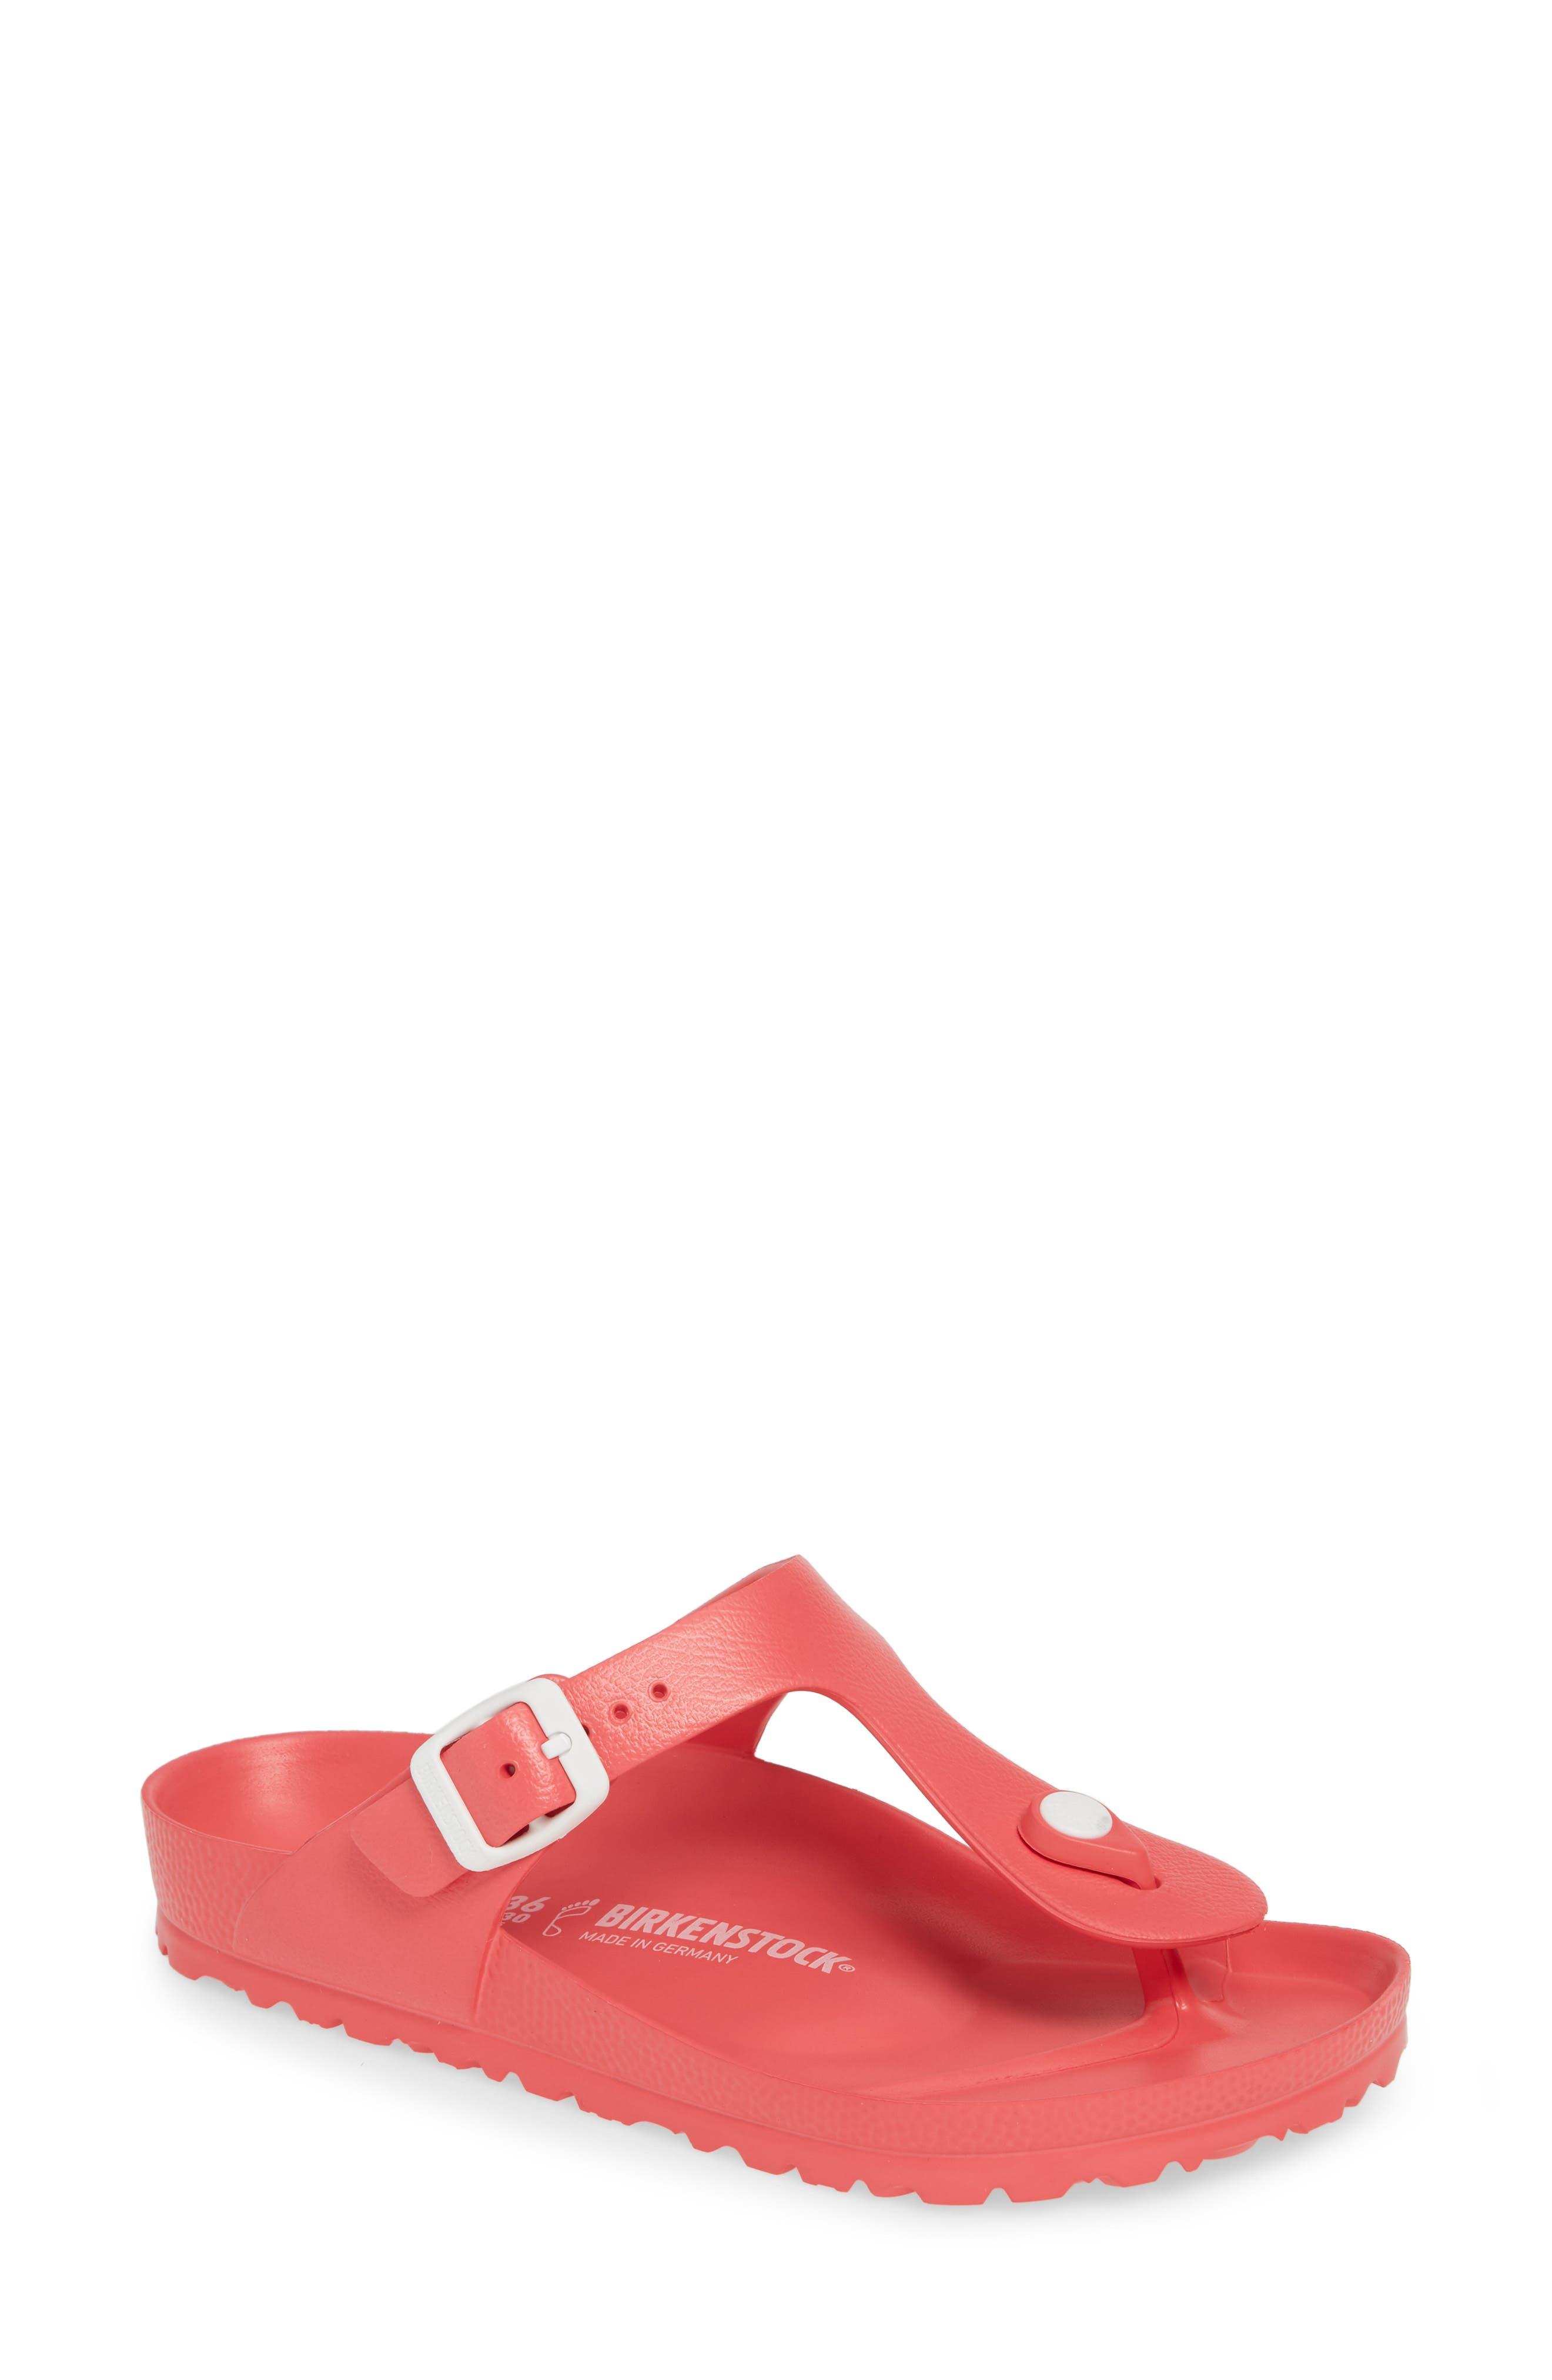 Birkenstock Essentials - Gizeh Flip Flop, Pink